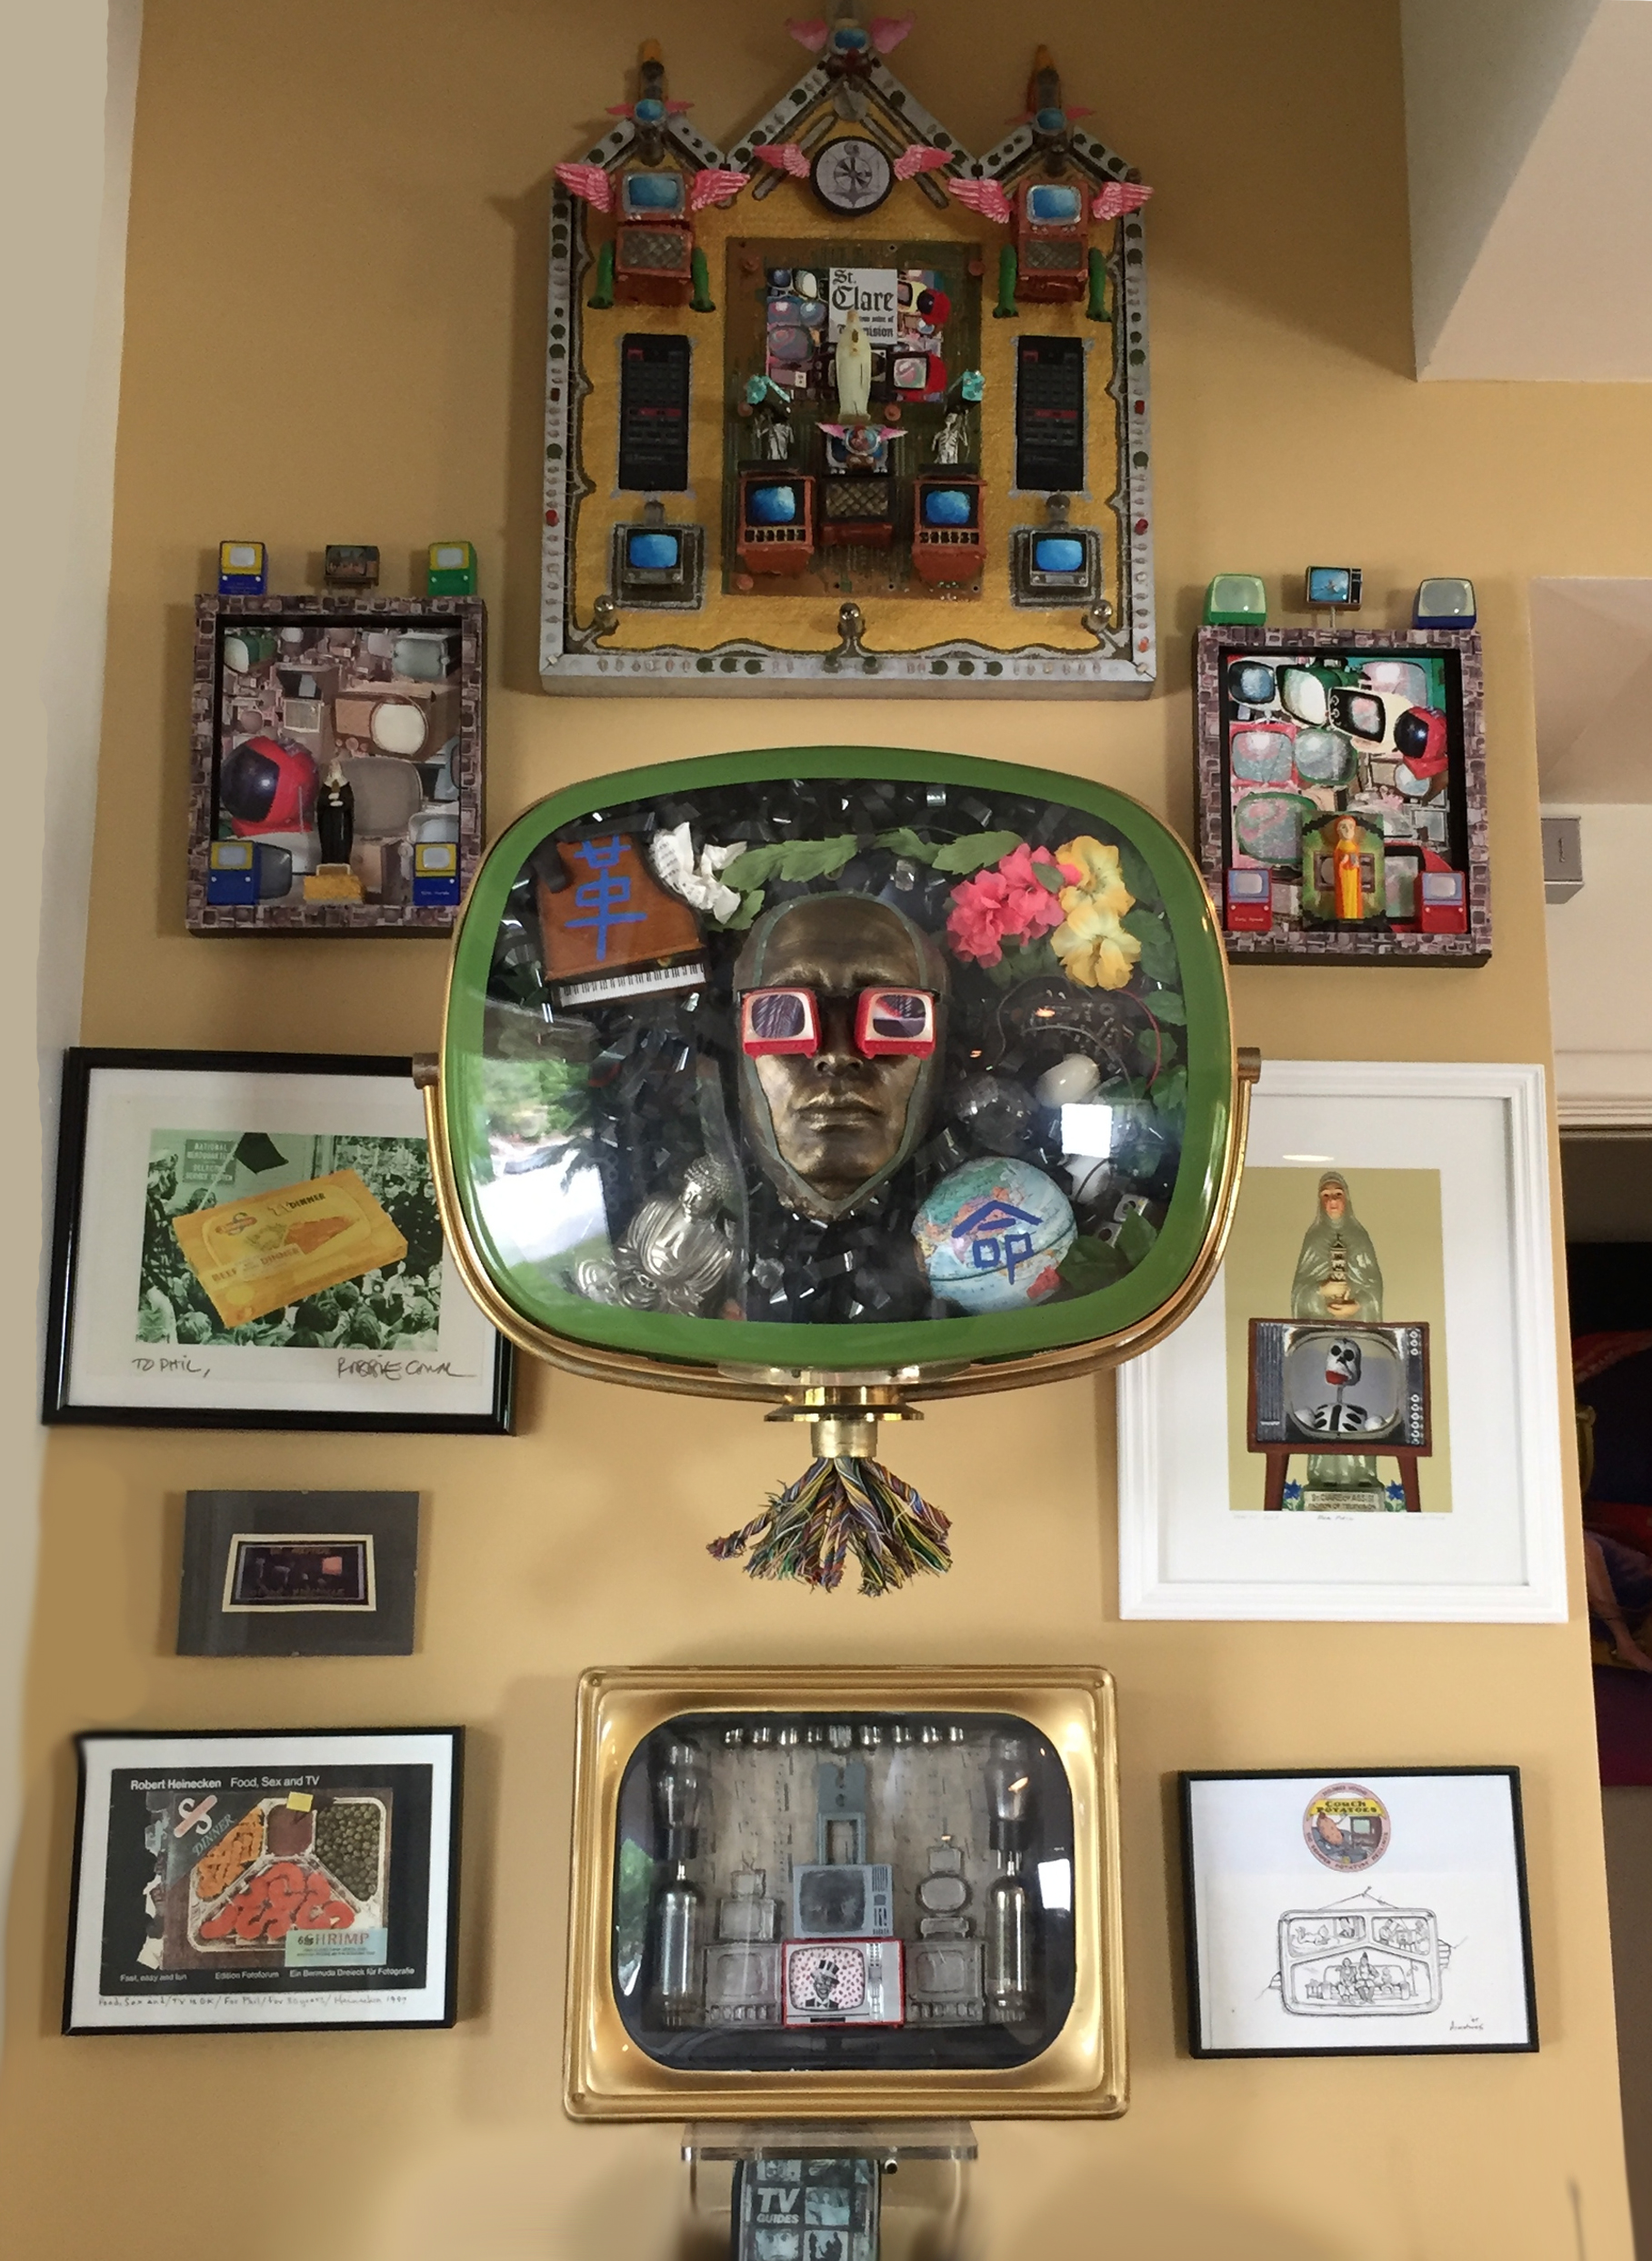 4 st clare shrine 2015.jpg